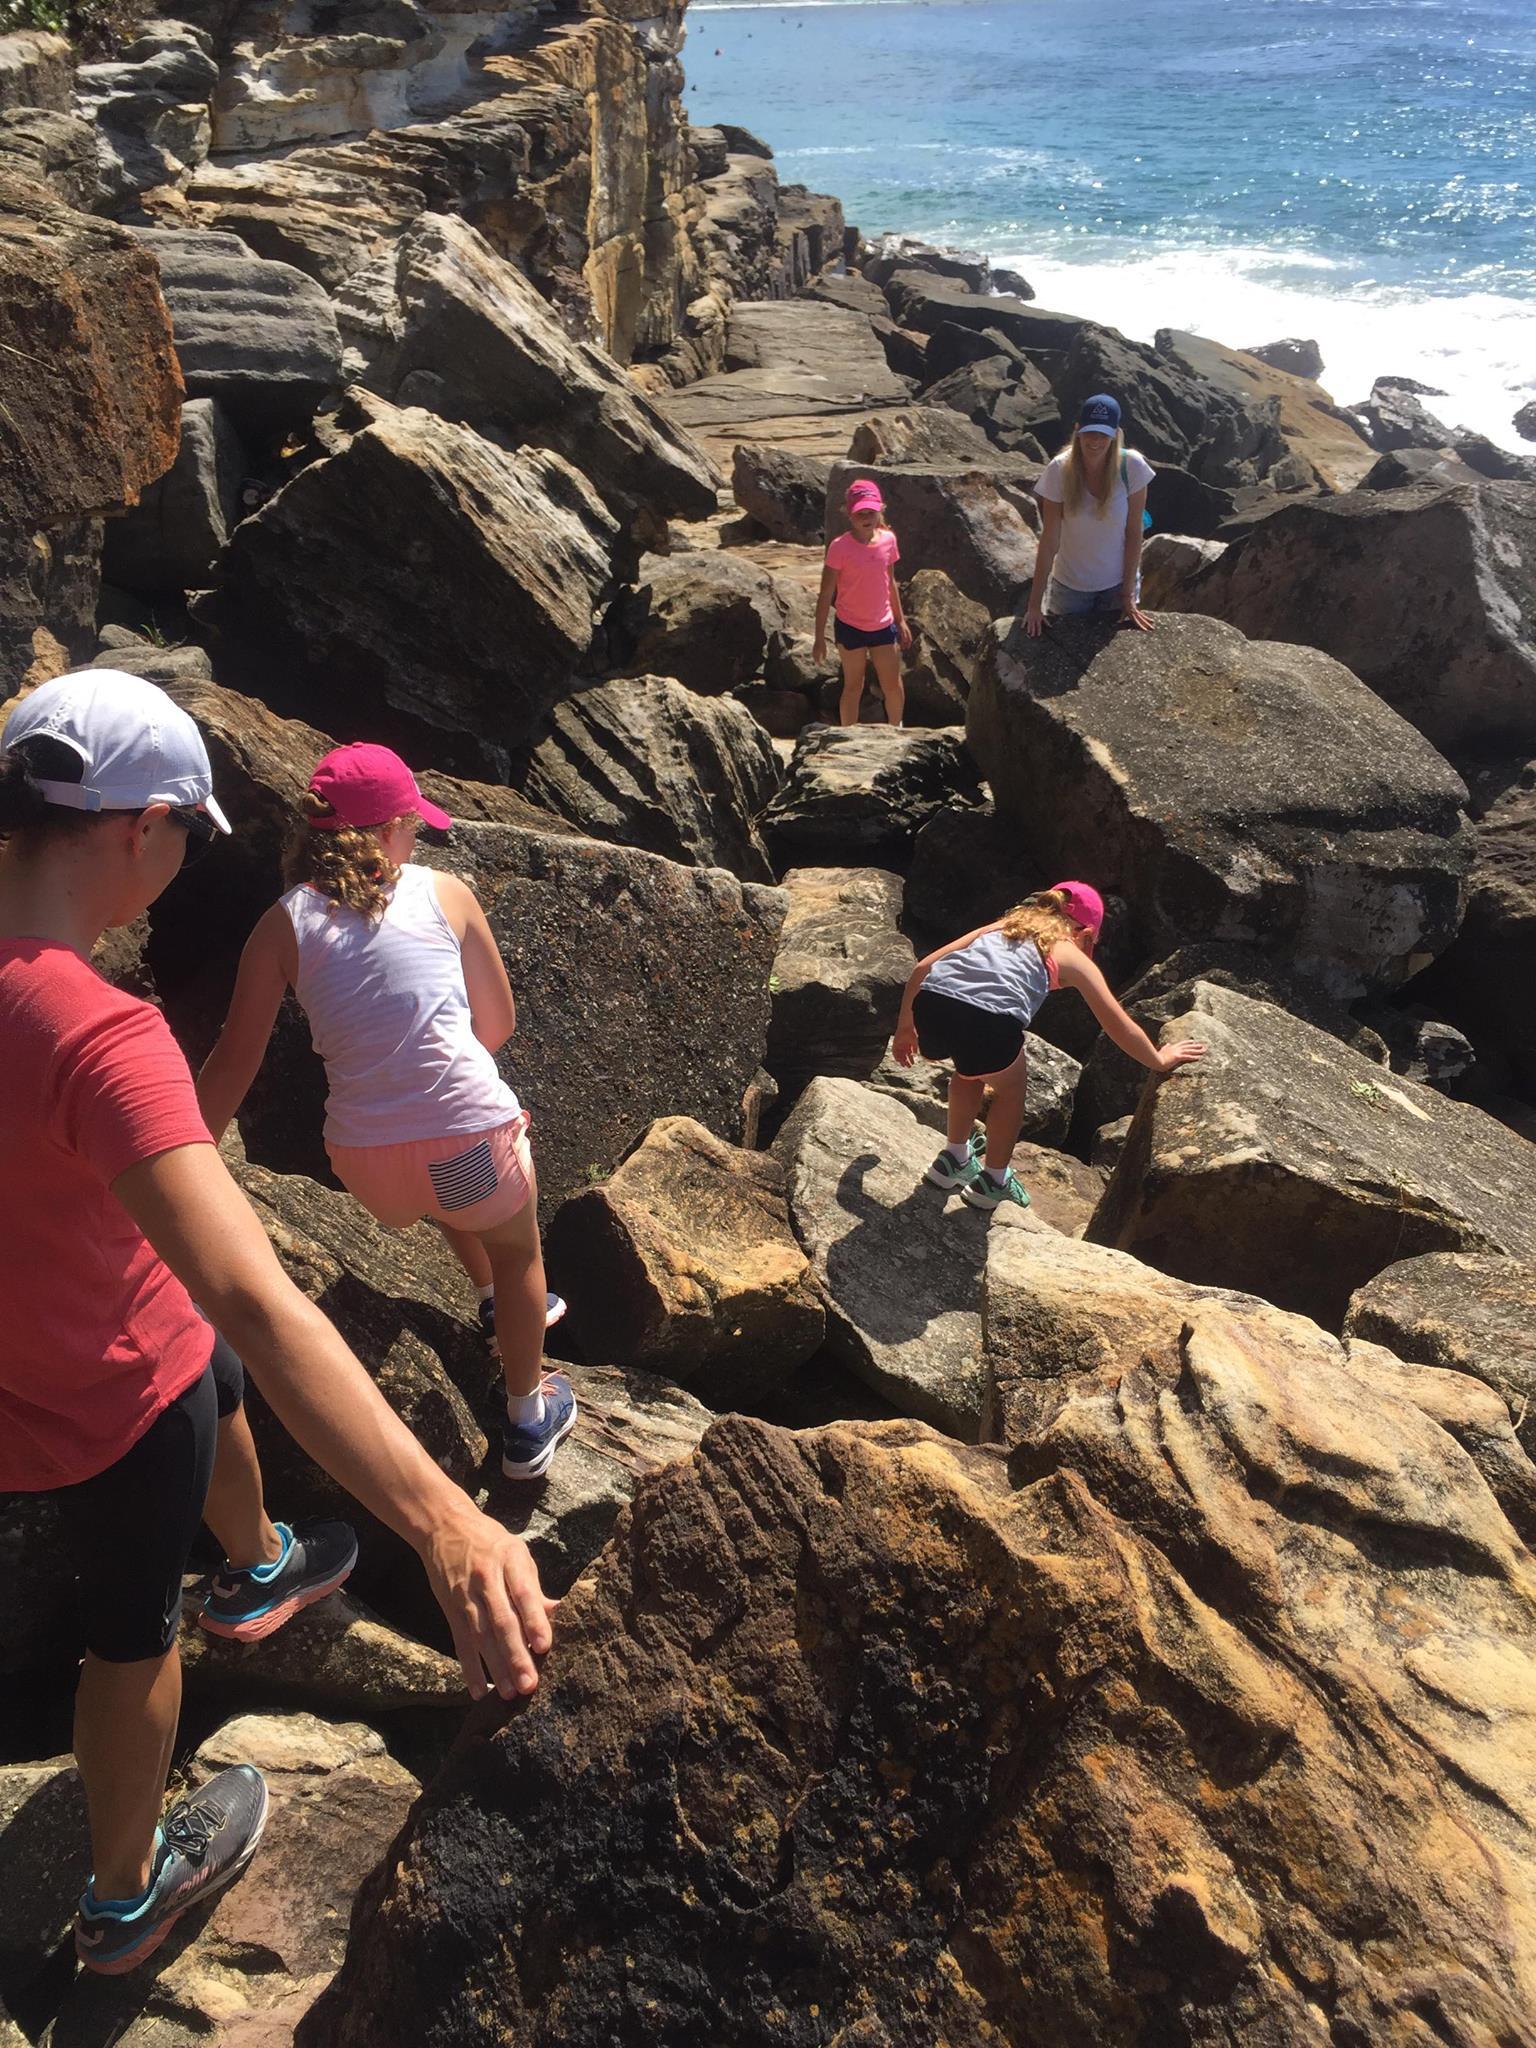 MissAdventure Rock Scrambling by the beach